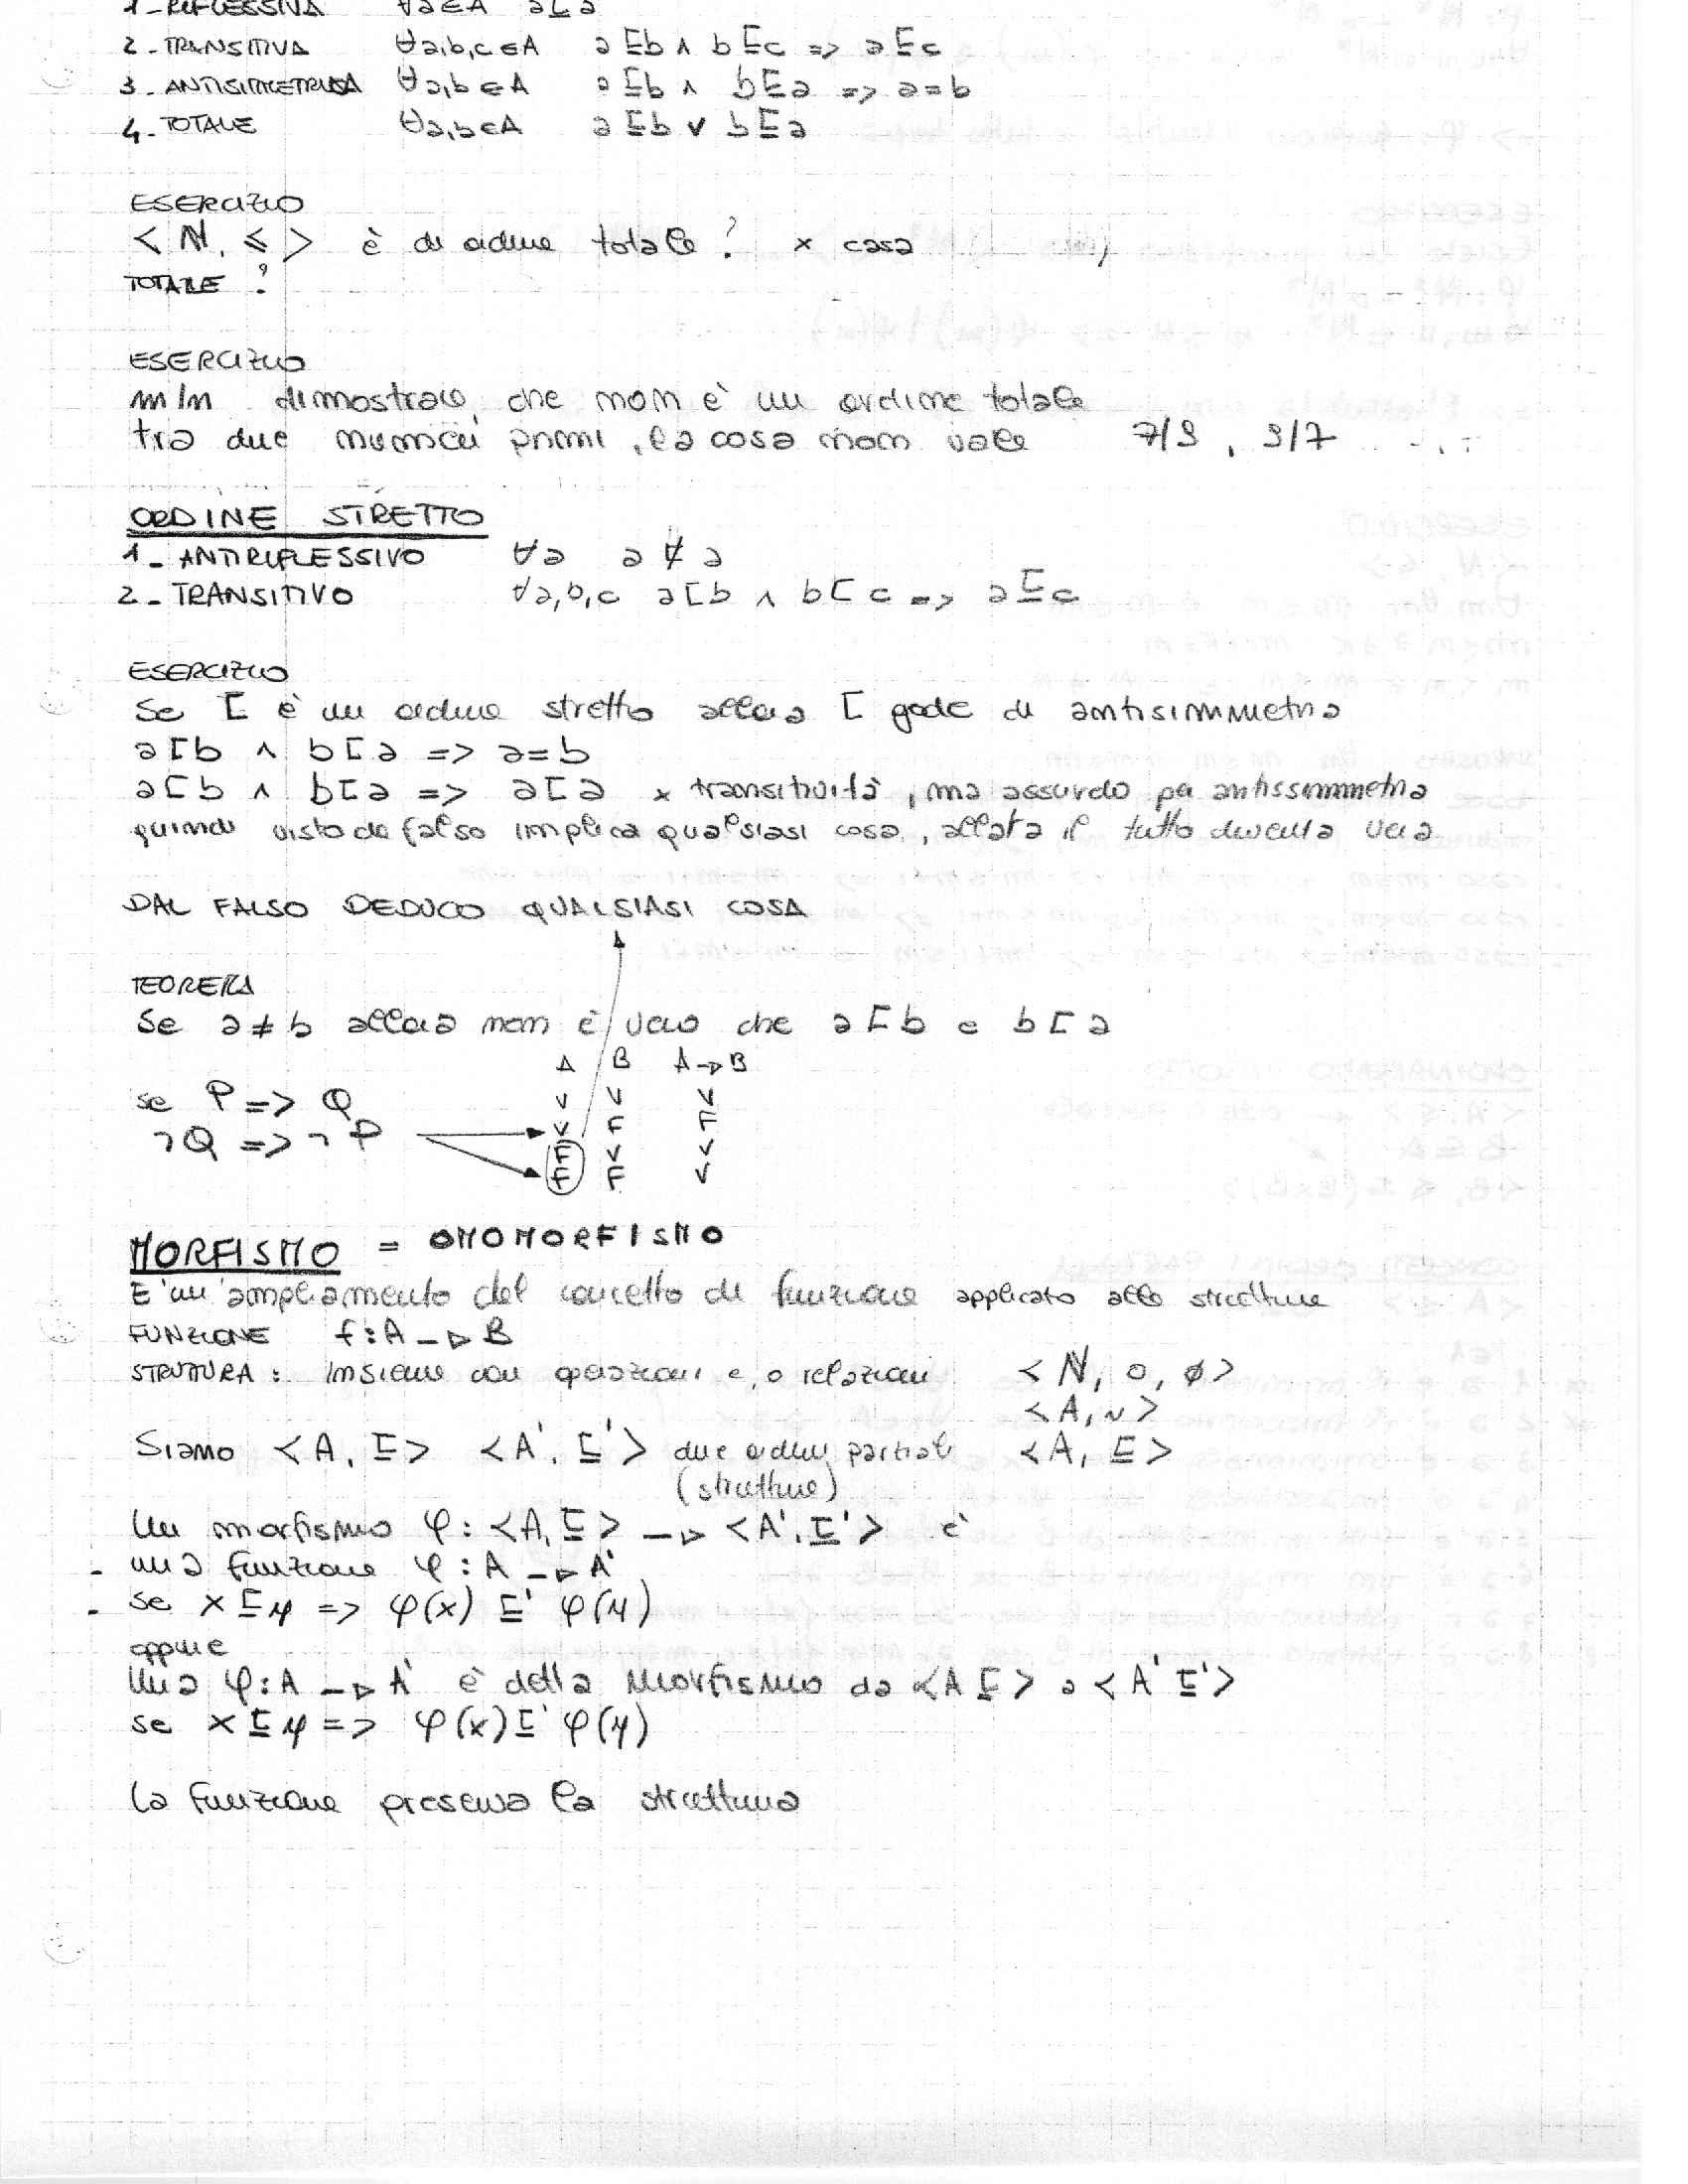 Logica e matematica discreta - Appunti Pag. 21